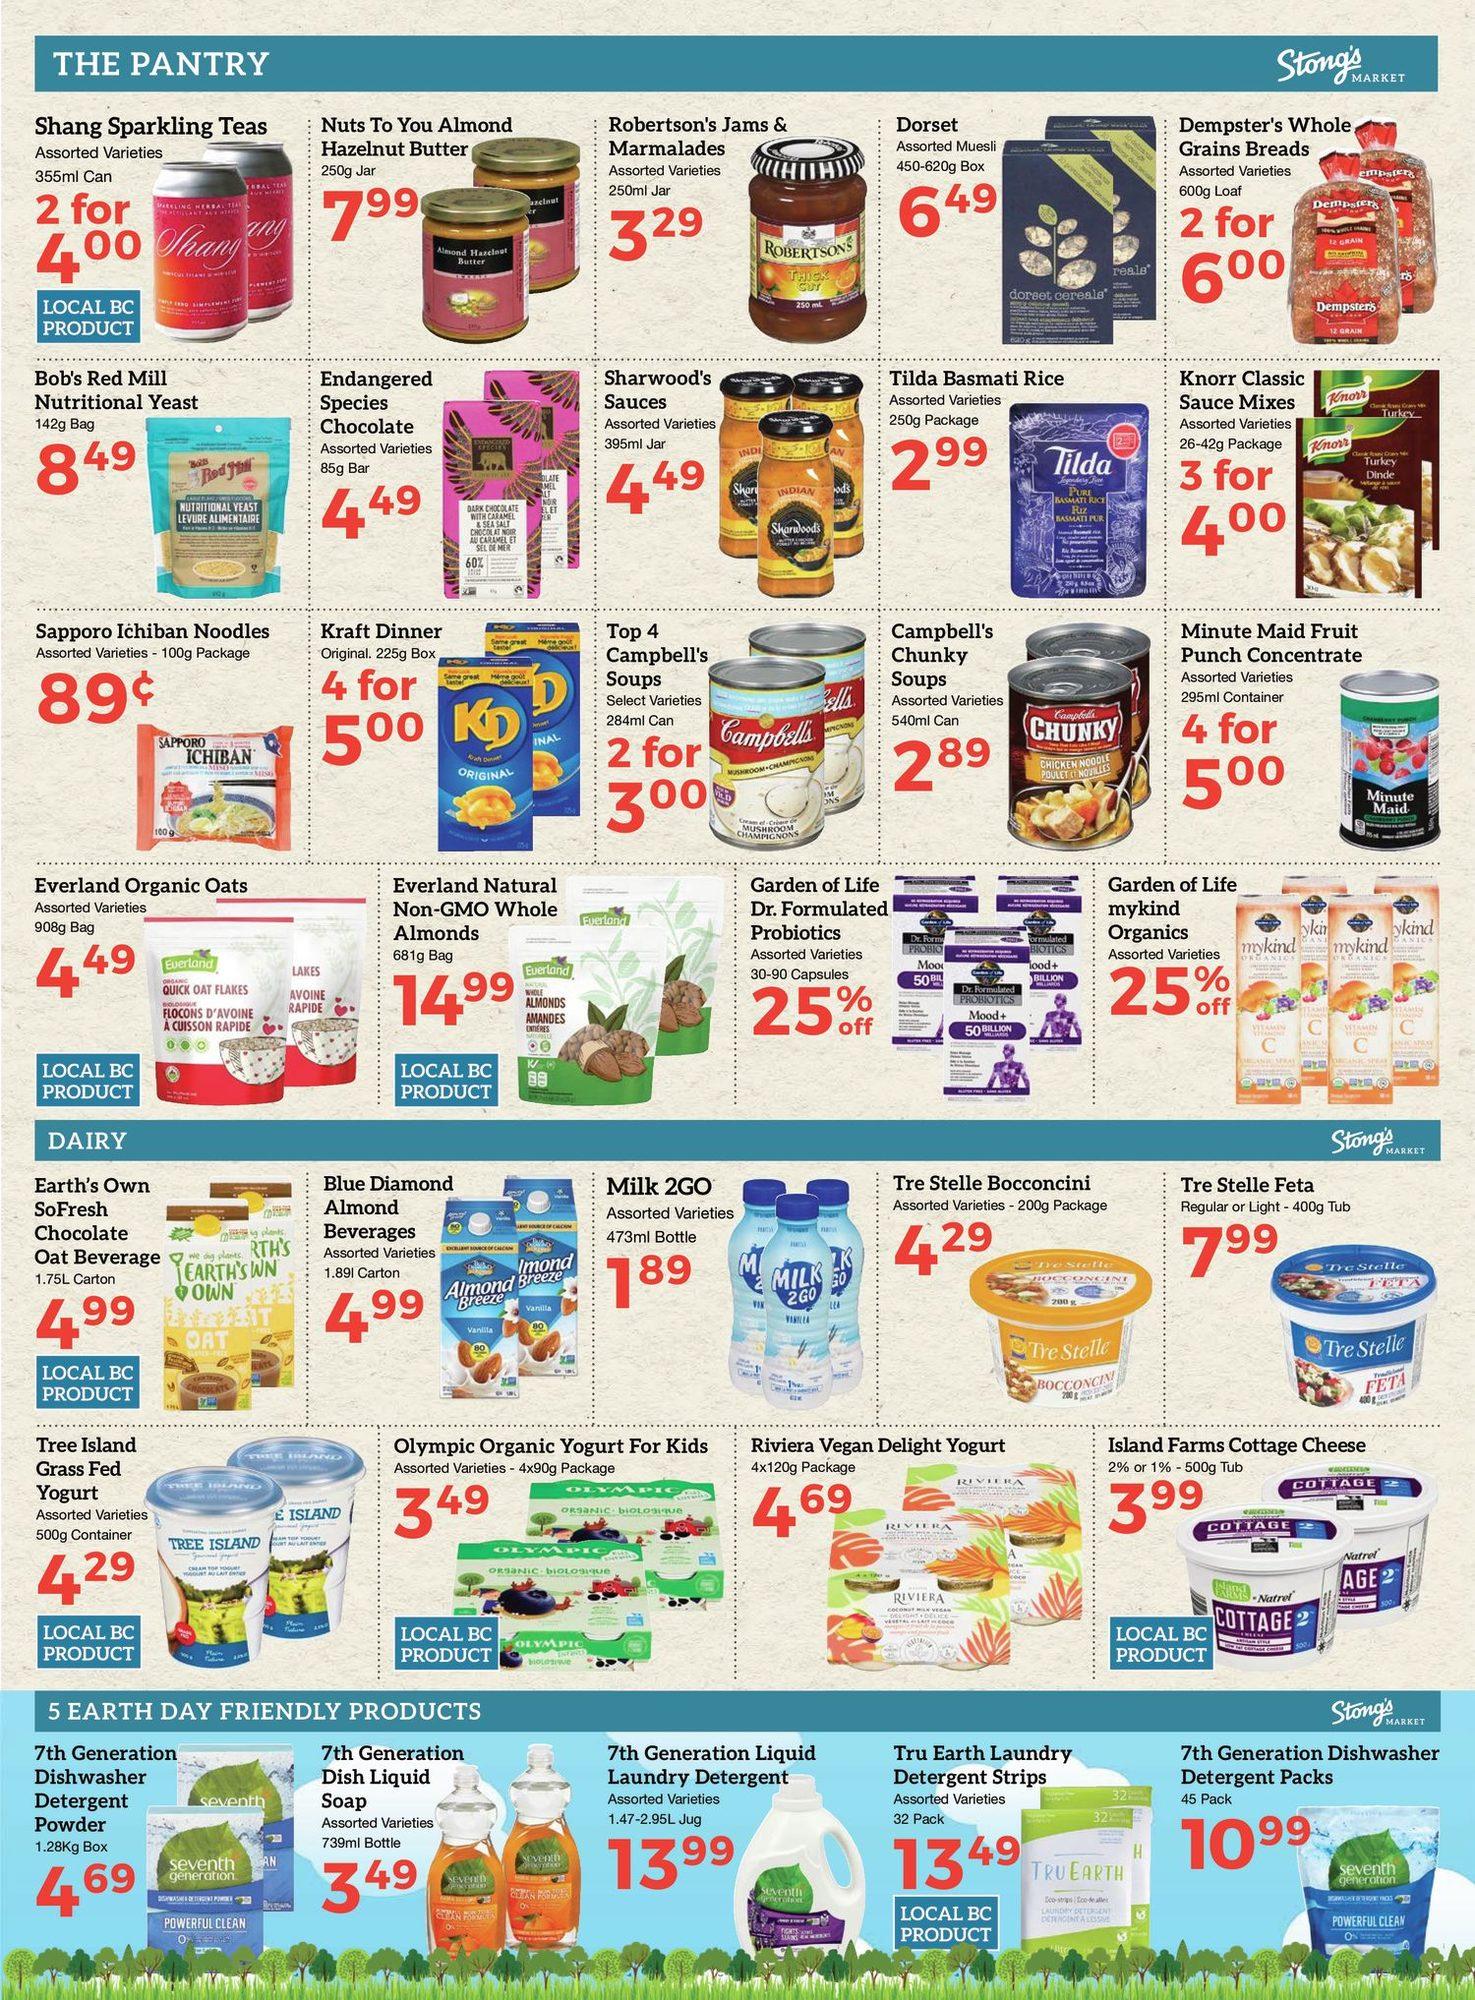 Stong's Market - 2 Weeks of Savings - Page 3